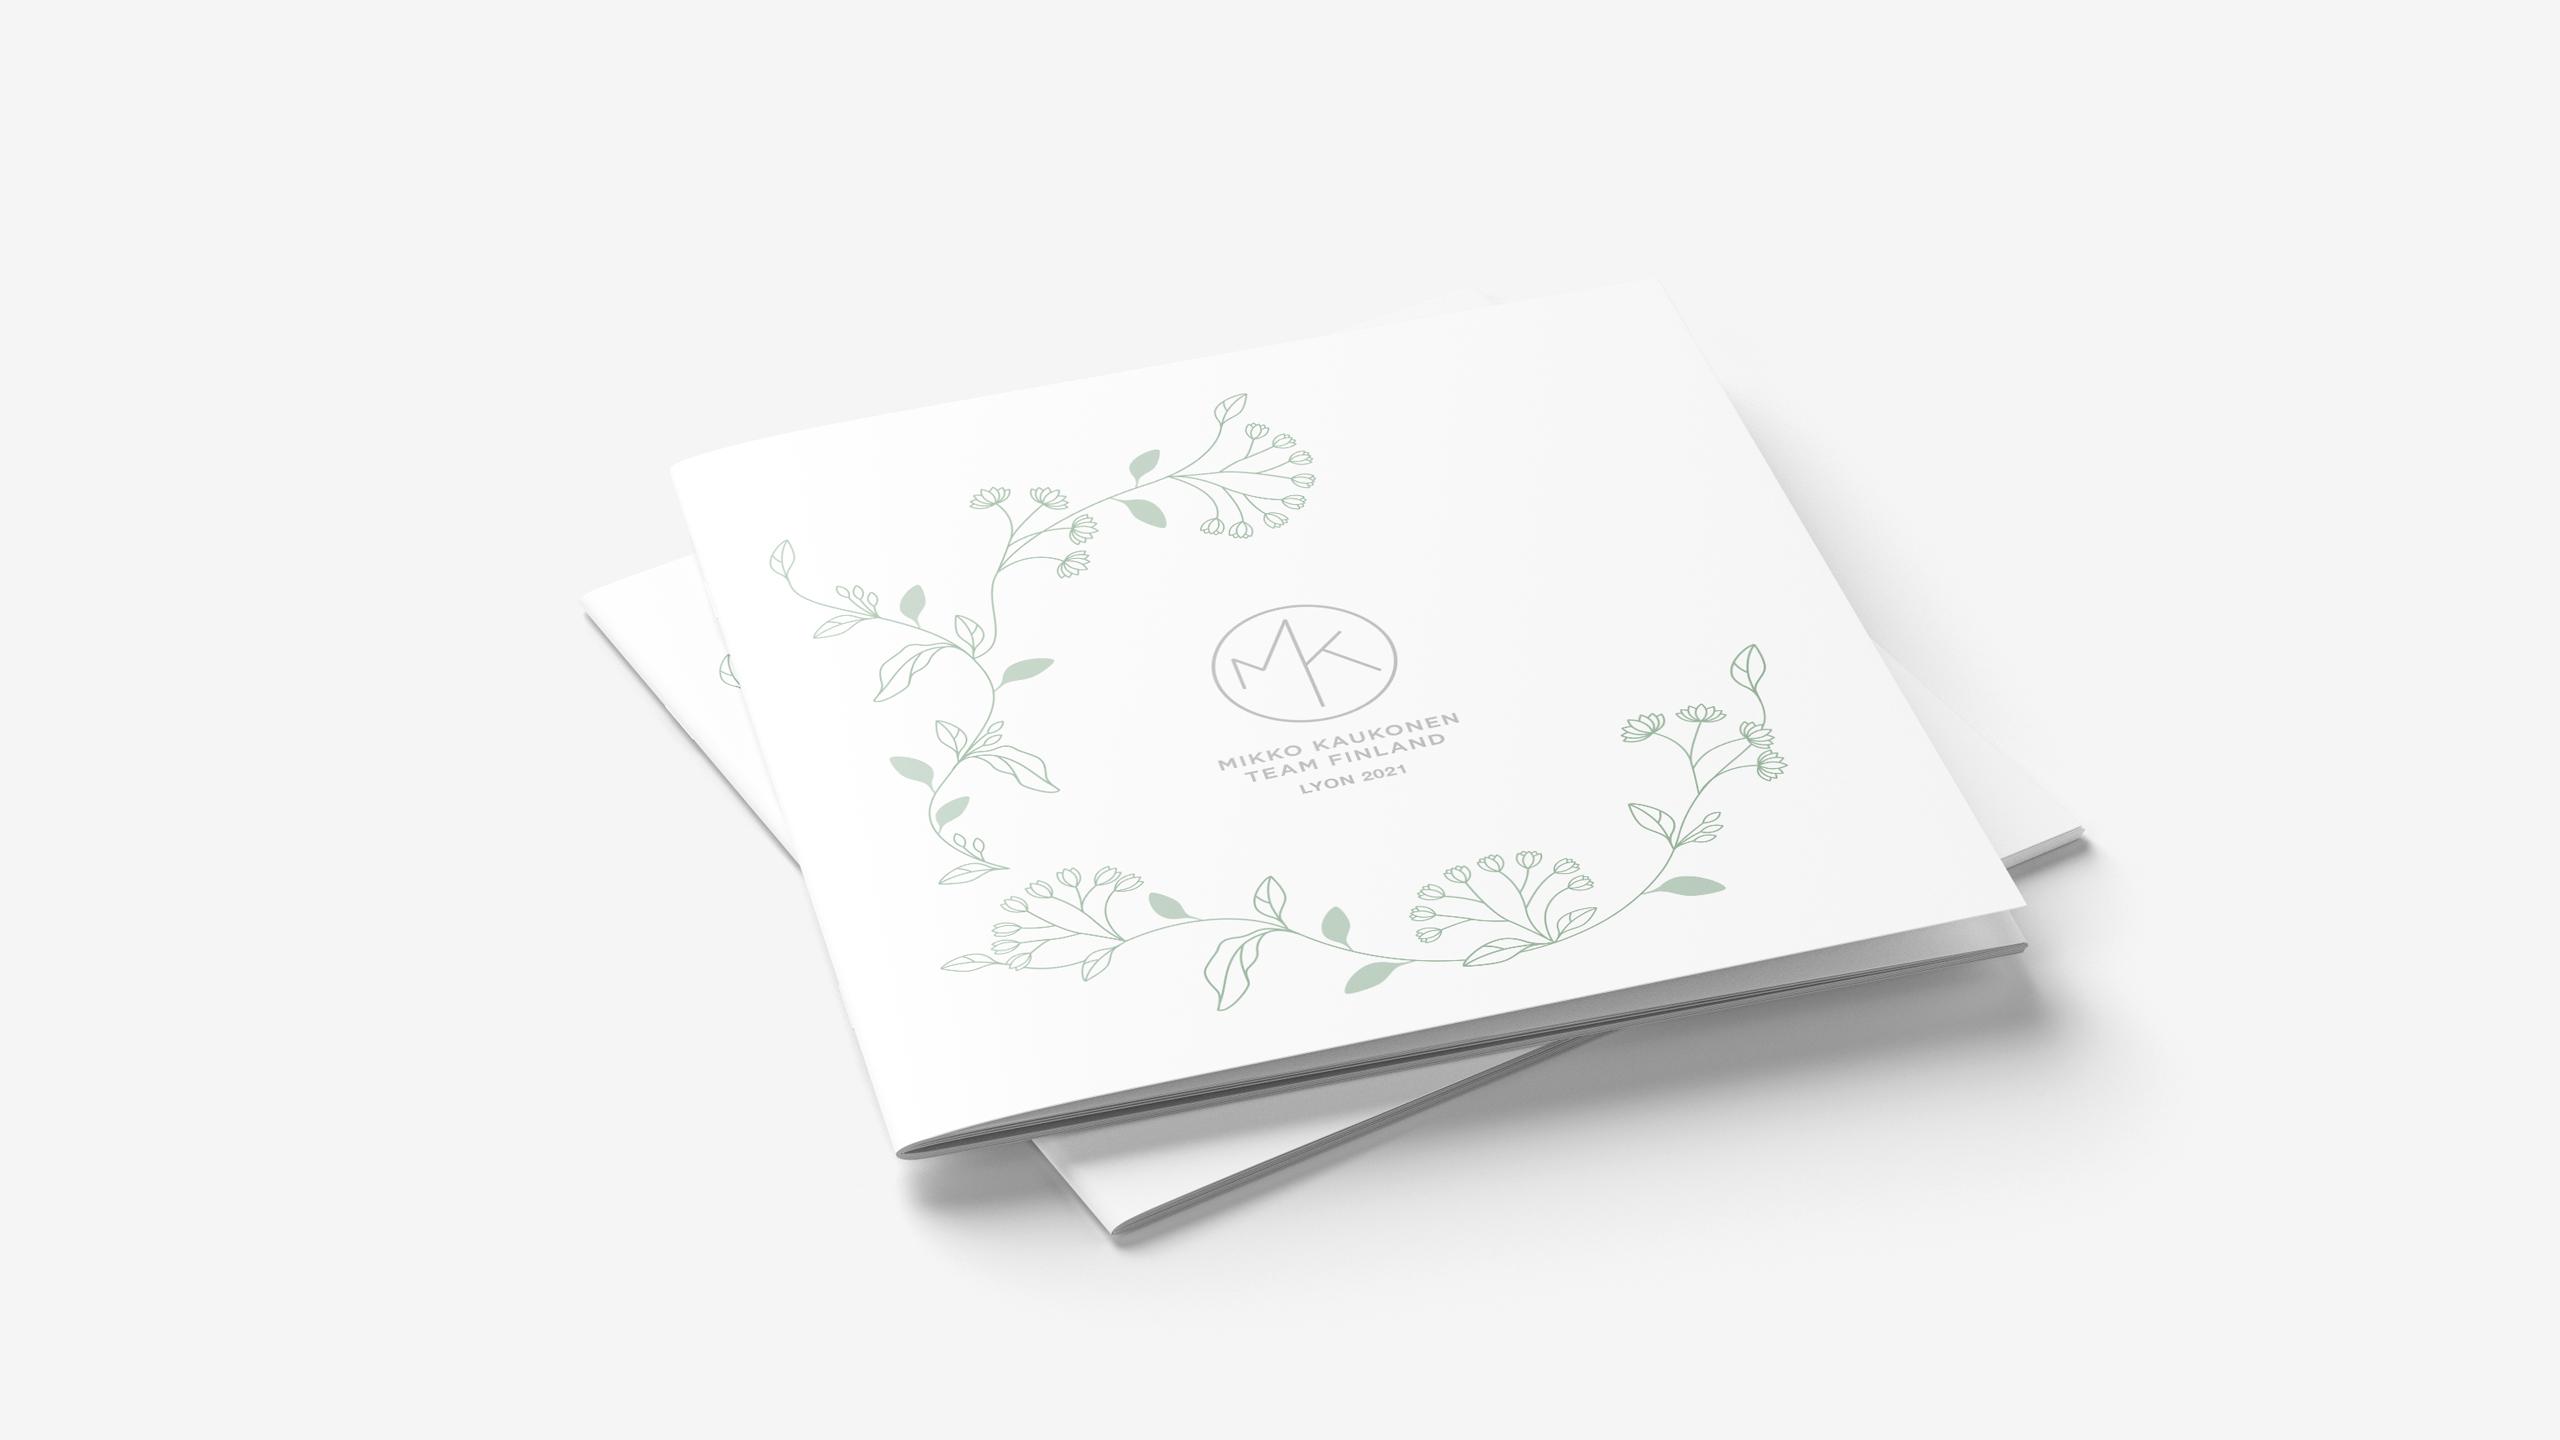 Boc_case_brochure_cover_2